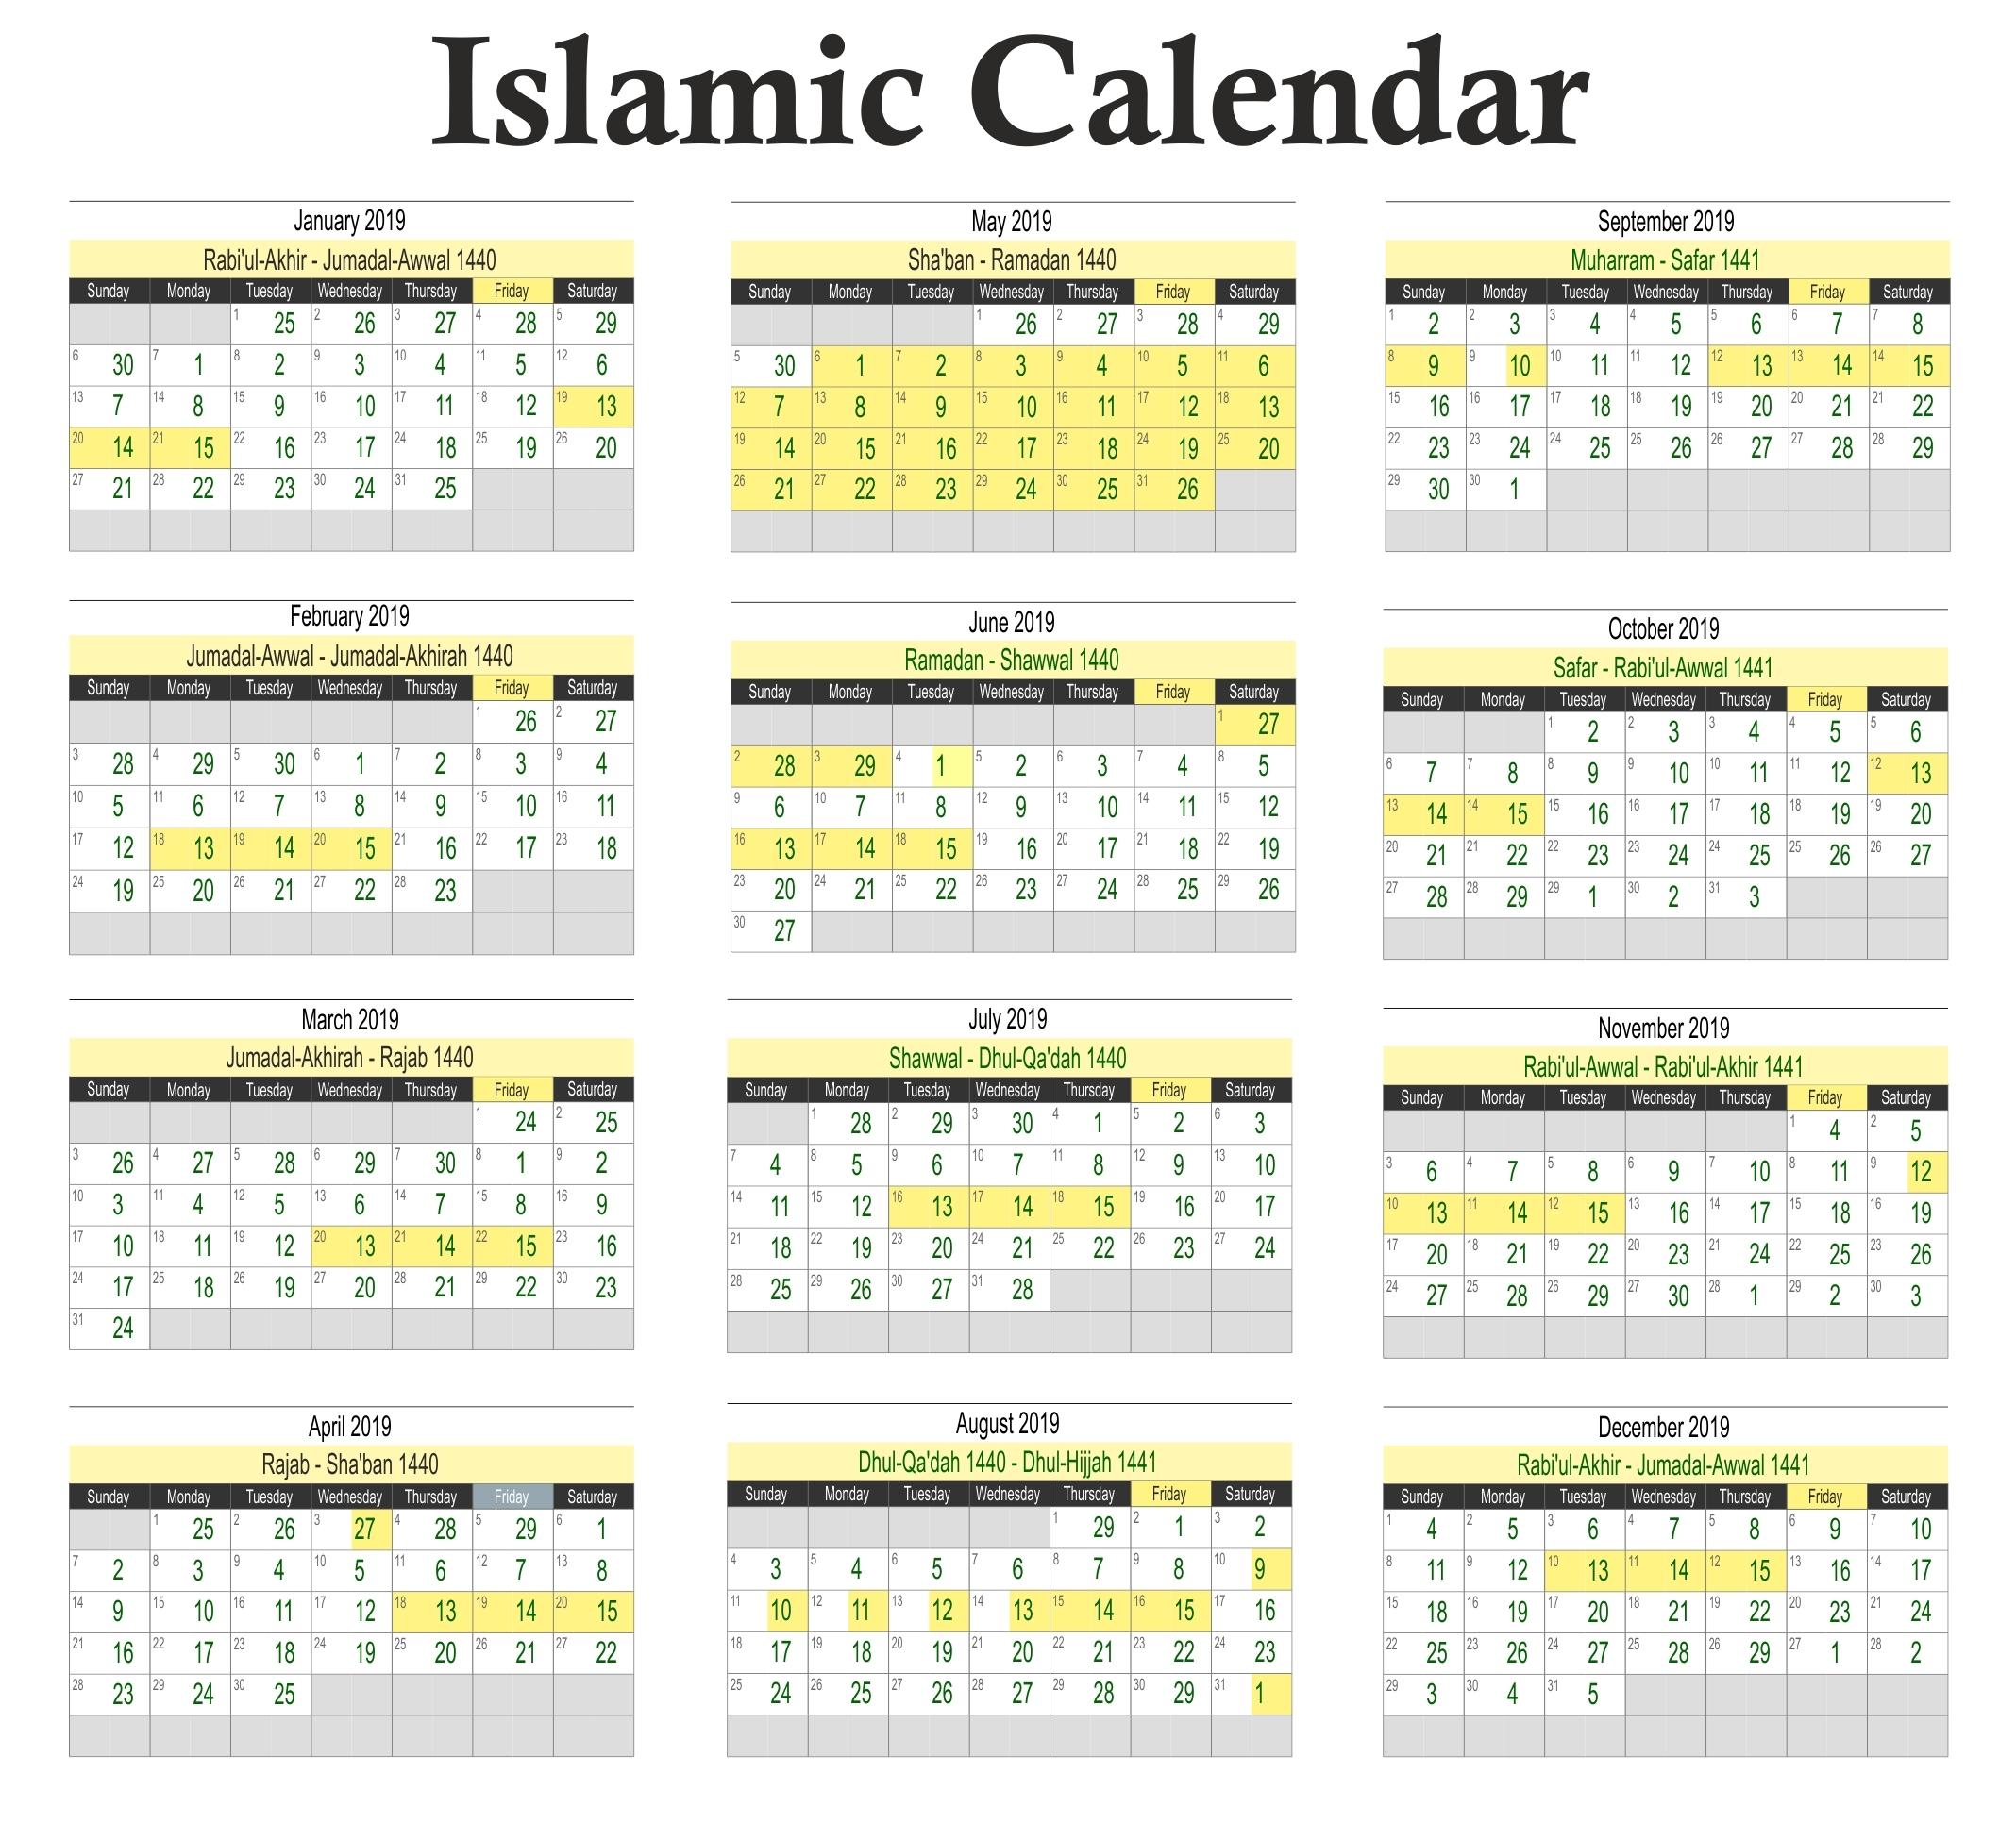 Calendar Muslim Holidays 2019 • Printable Blank Calendar Template regarding Islamic Calendar For The Philippines